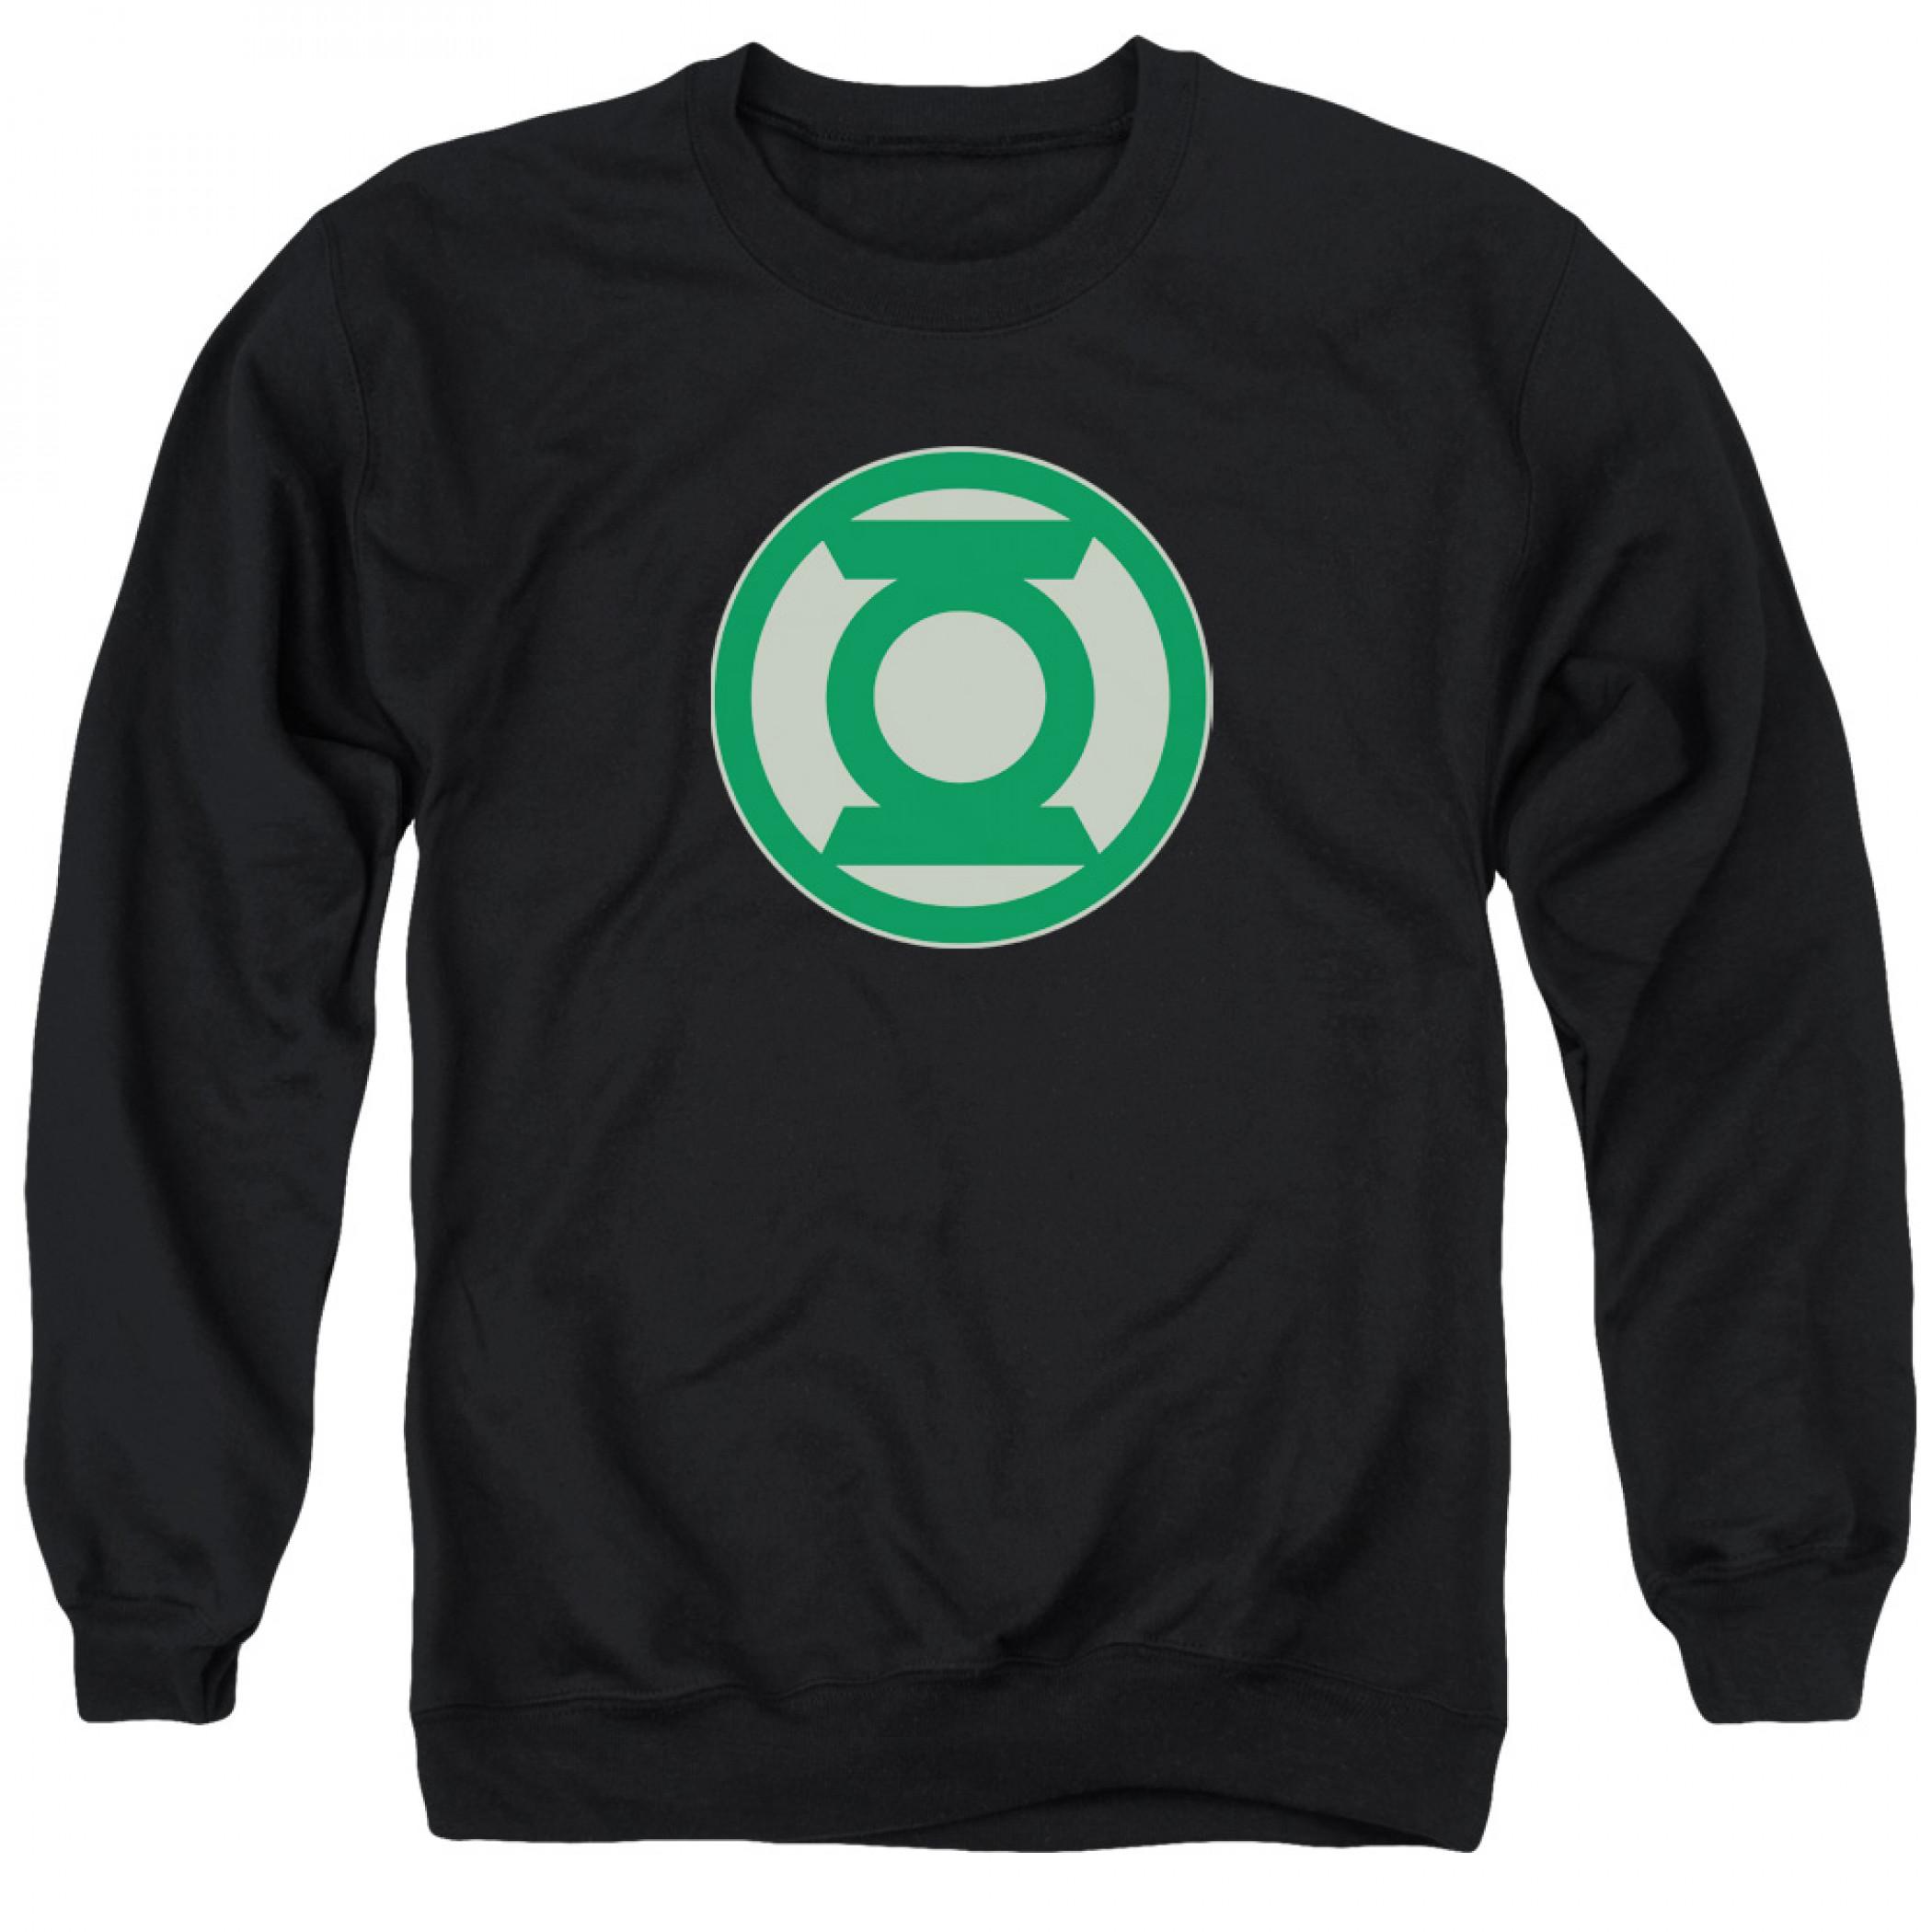 Green Lantern Logo Men's Black Crewneck Sweatshirt